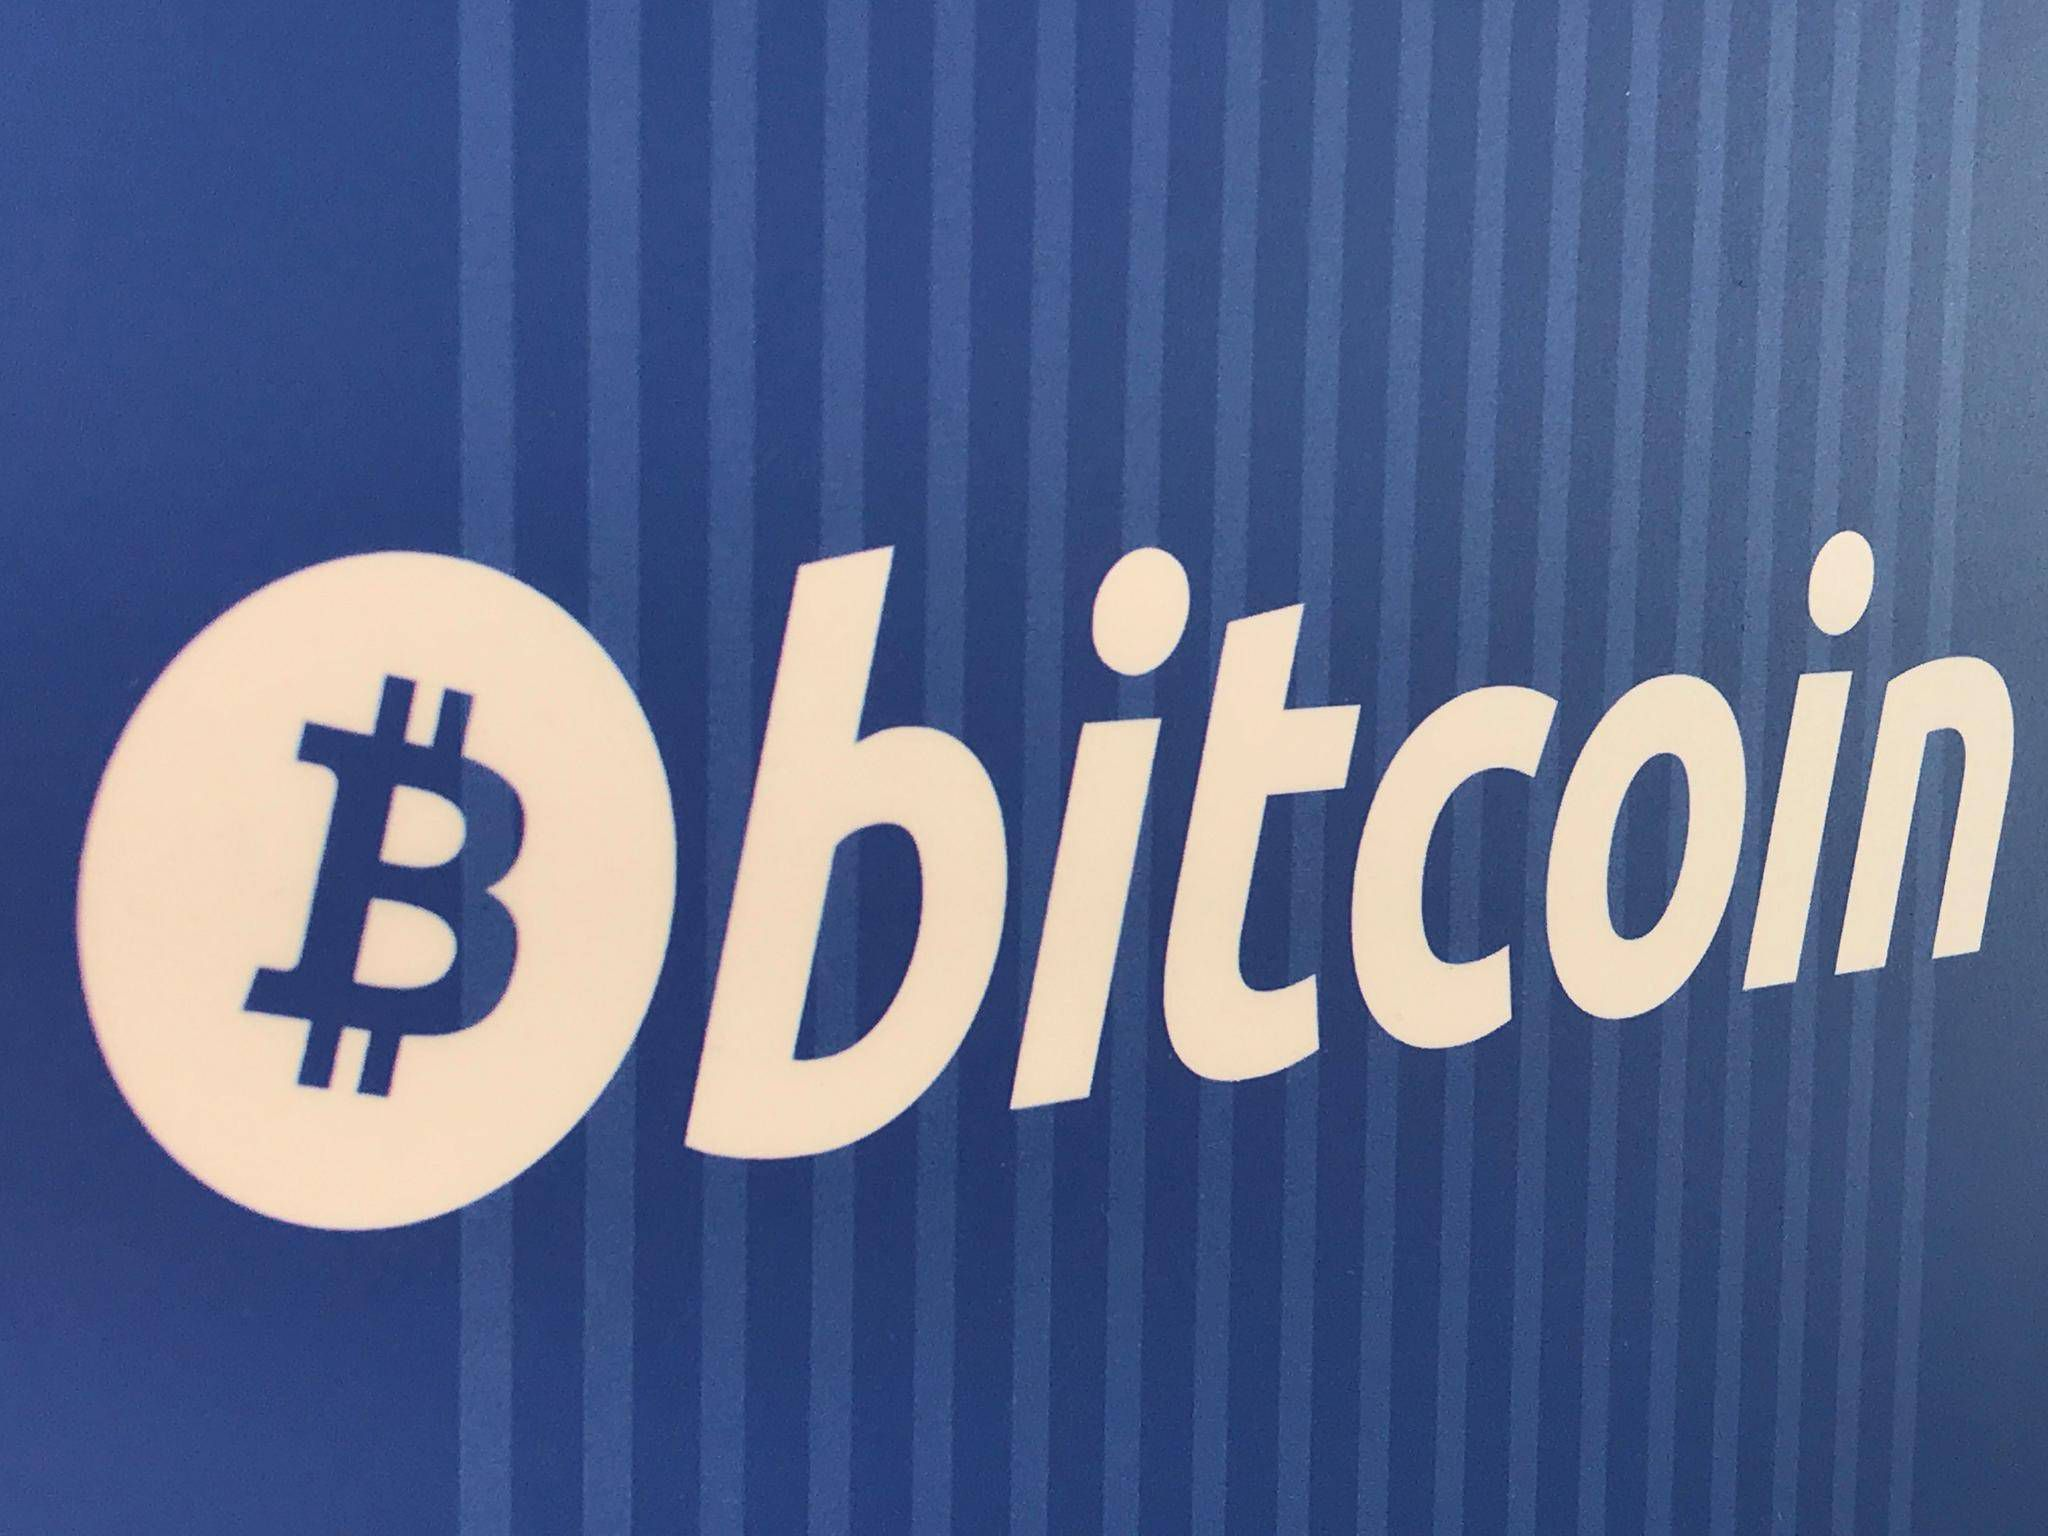 Canadian Blockchain Etf Launches Amid Bitcoin Volatility The Globe